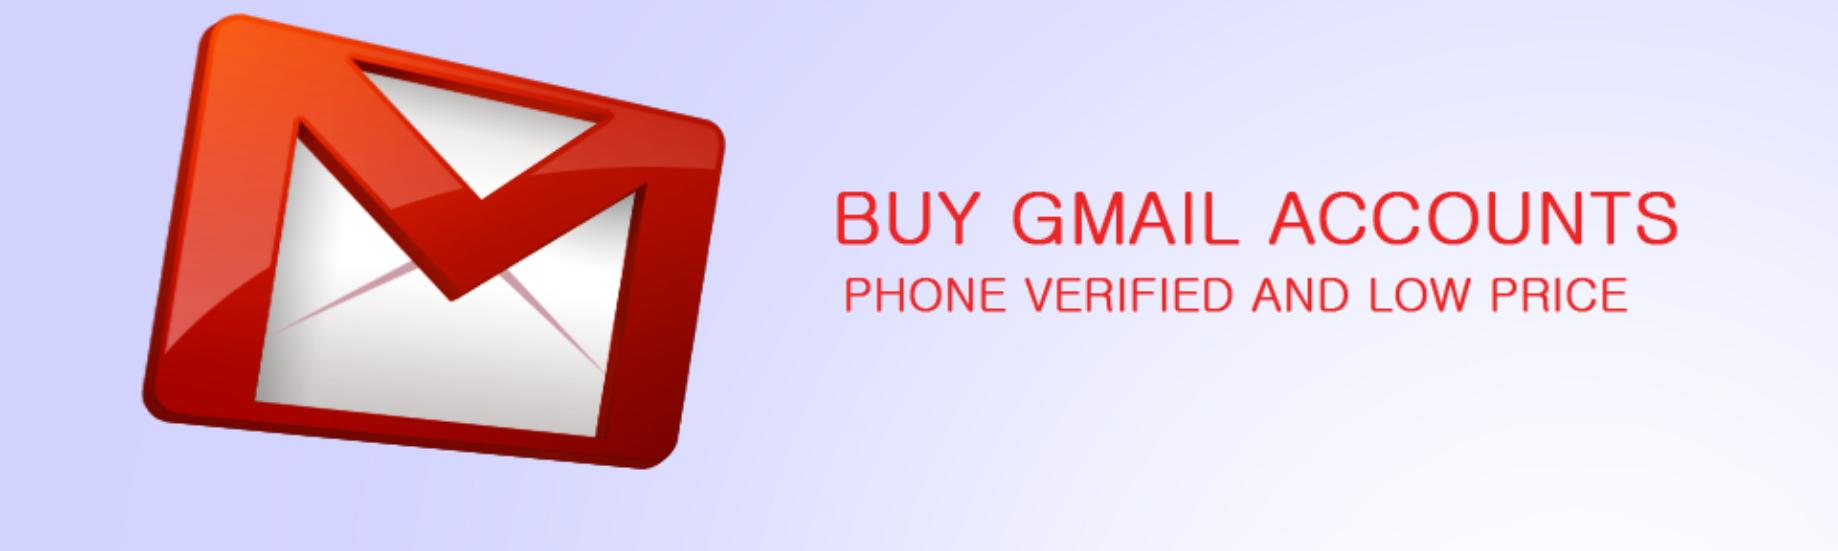 Buy Gmail Accounts service